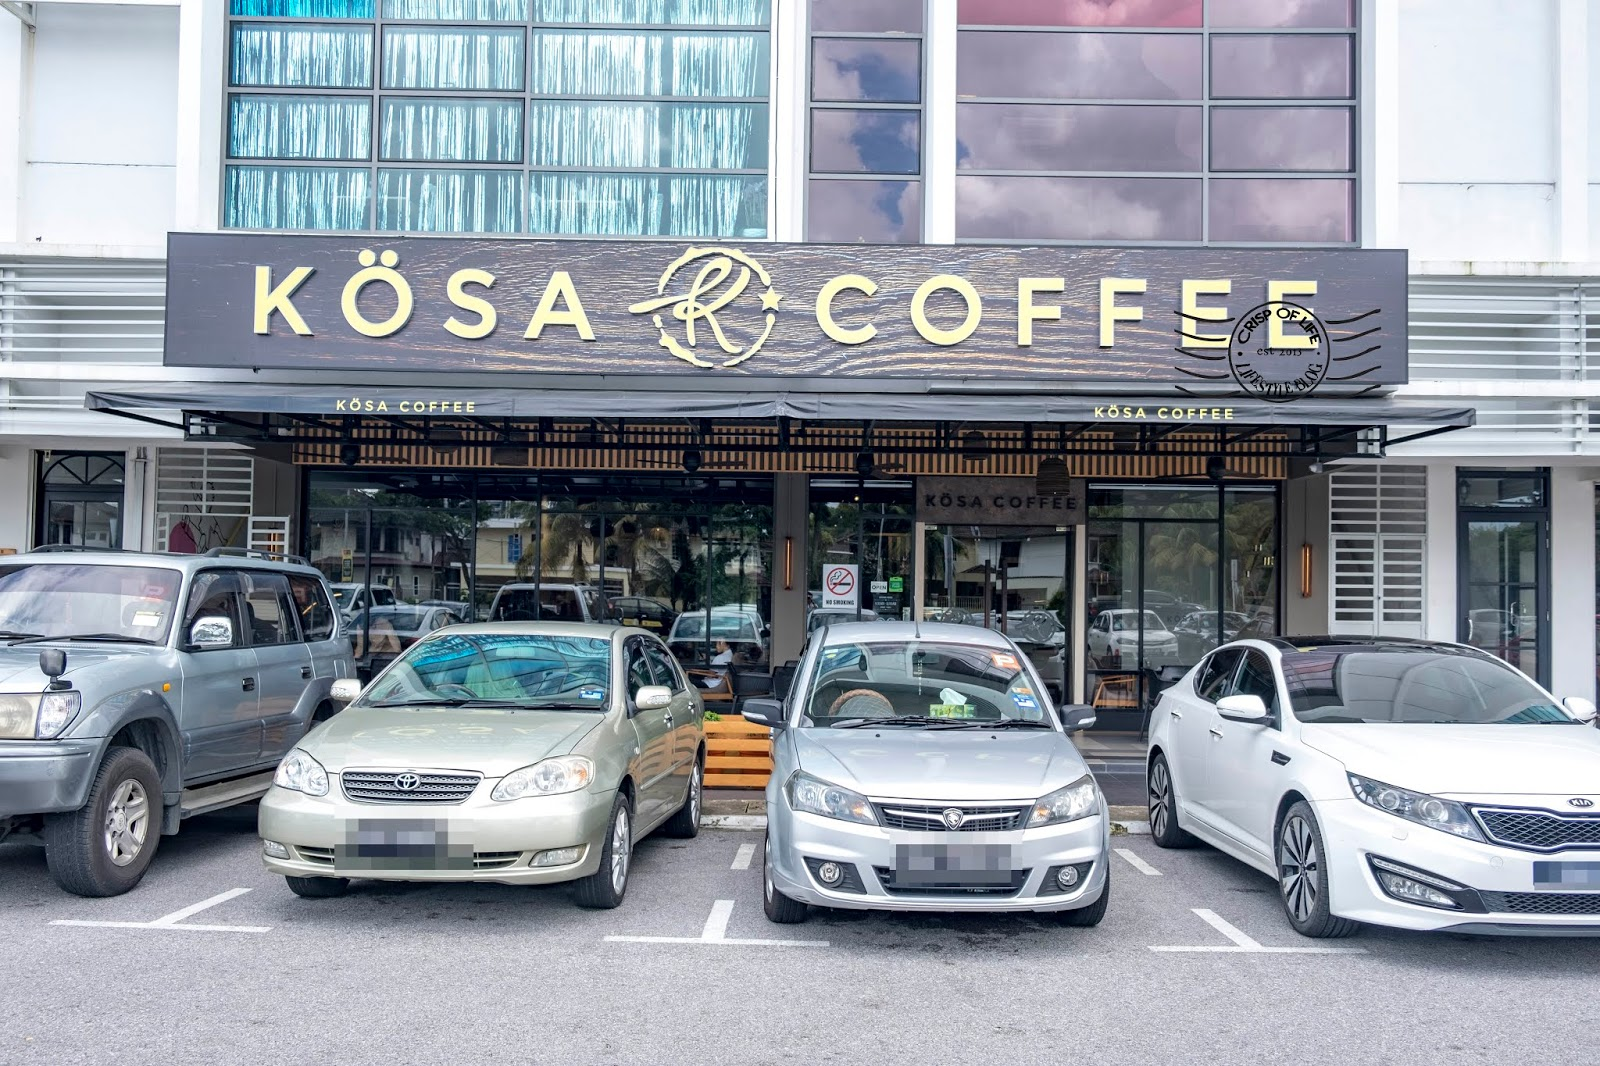 Kosa Coffee @ Saradise Kuching, Sarawak